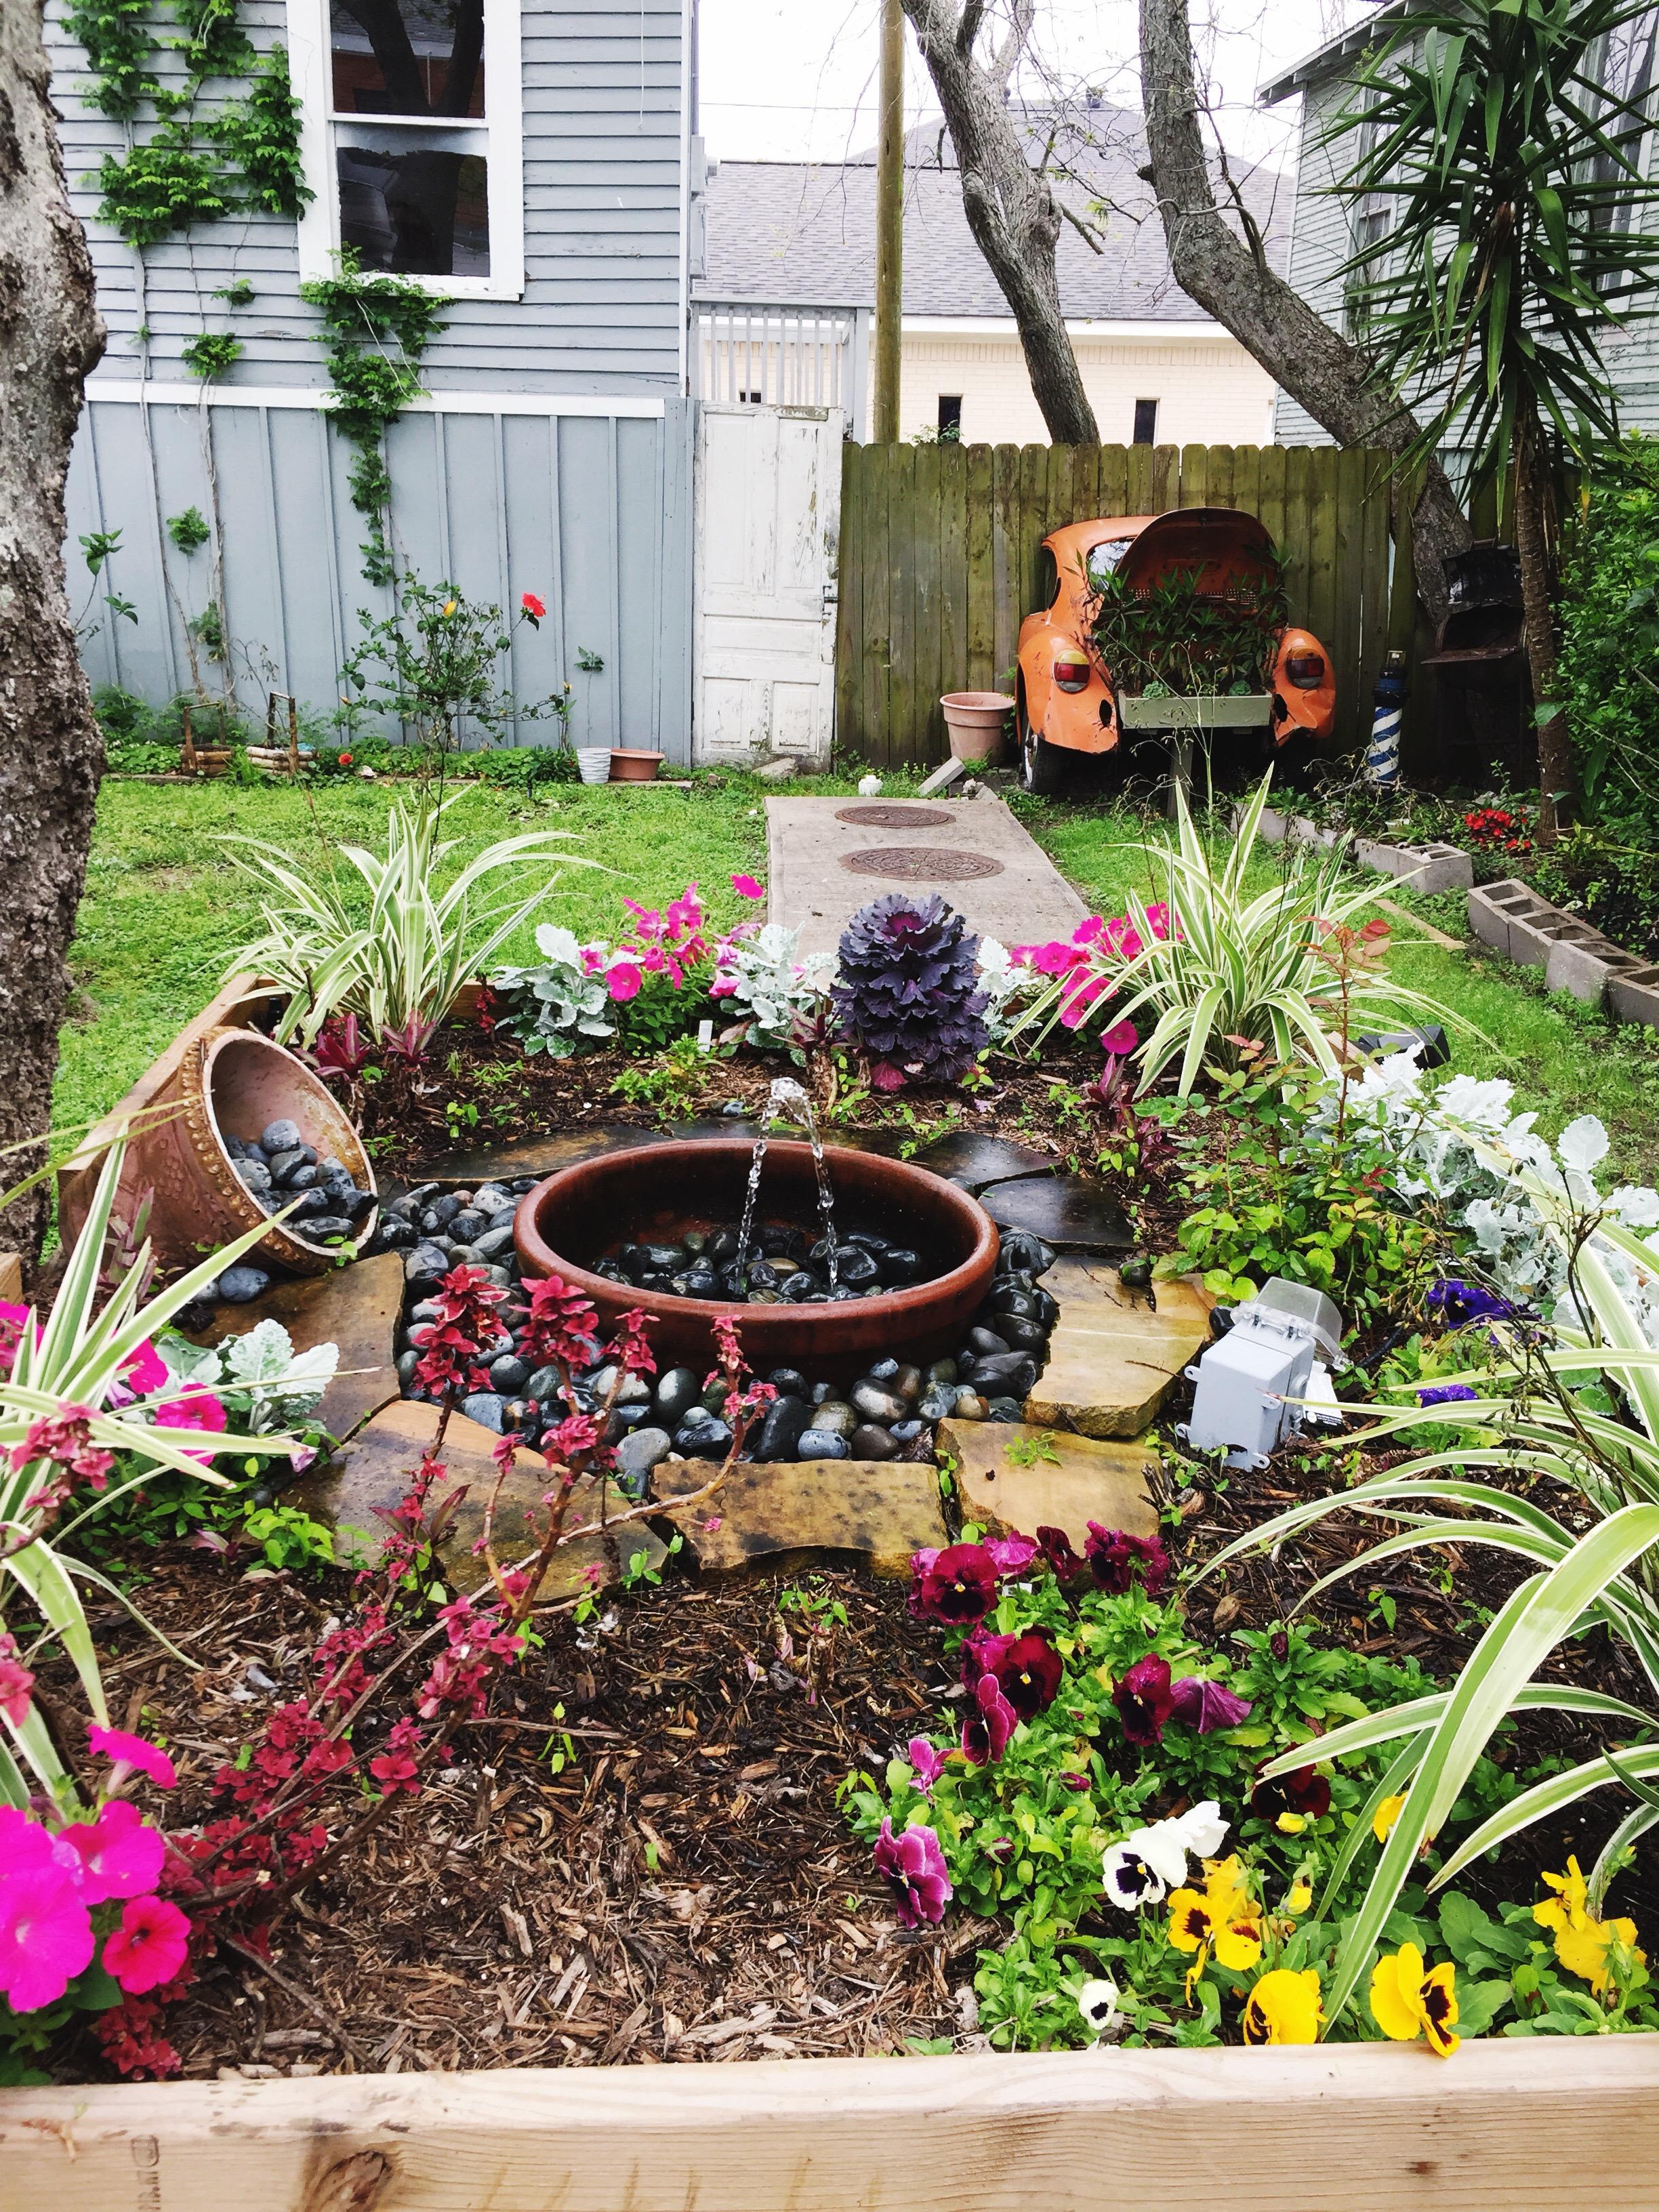 Shykatz cafe garden